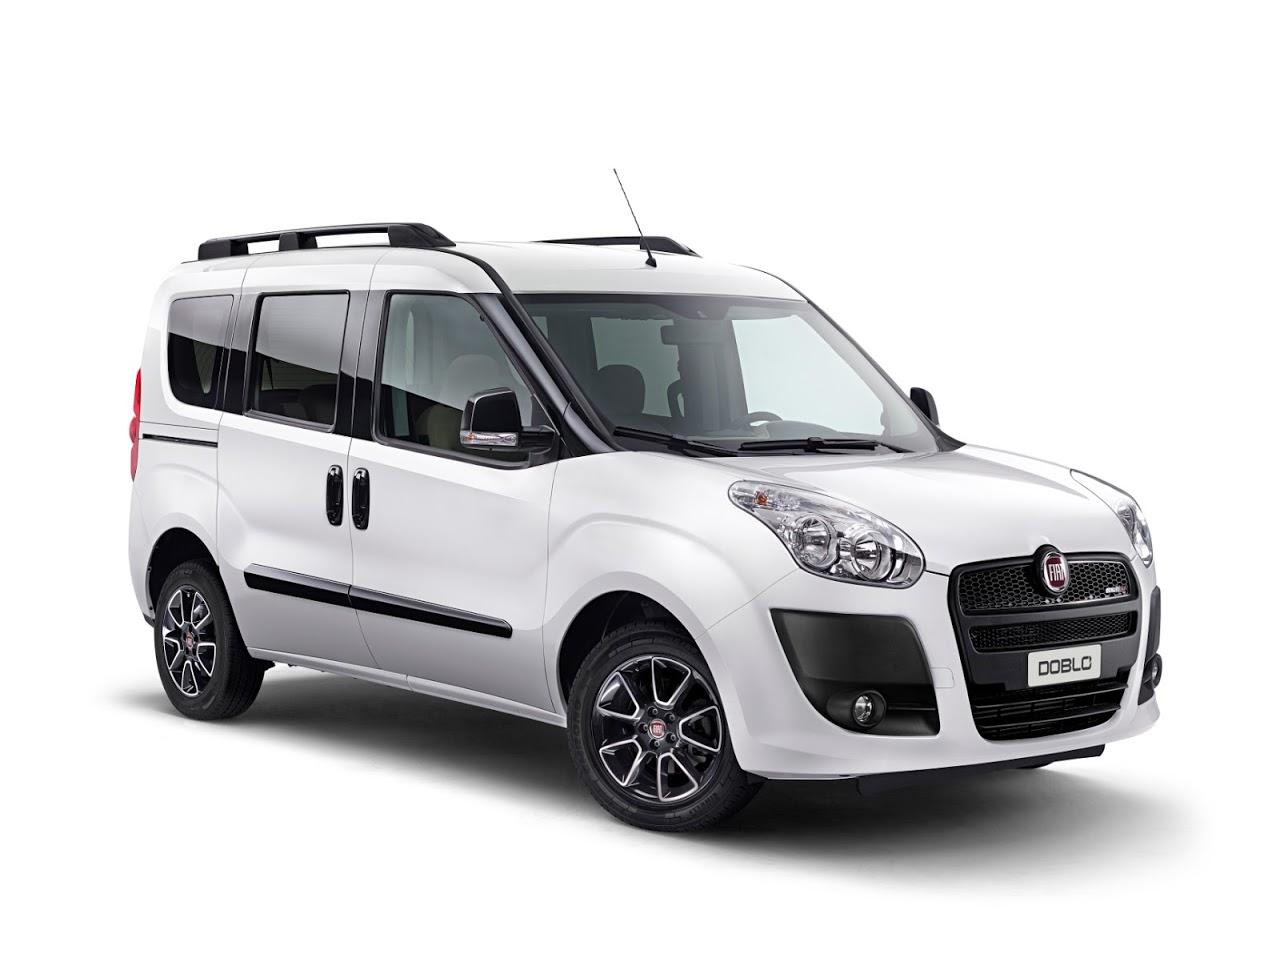 Yeni FiatDoblo 1.3 MJT.DieselManuell